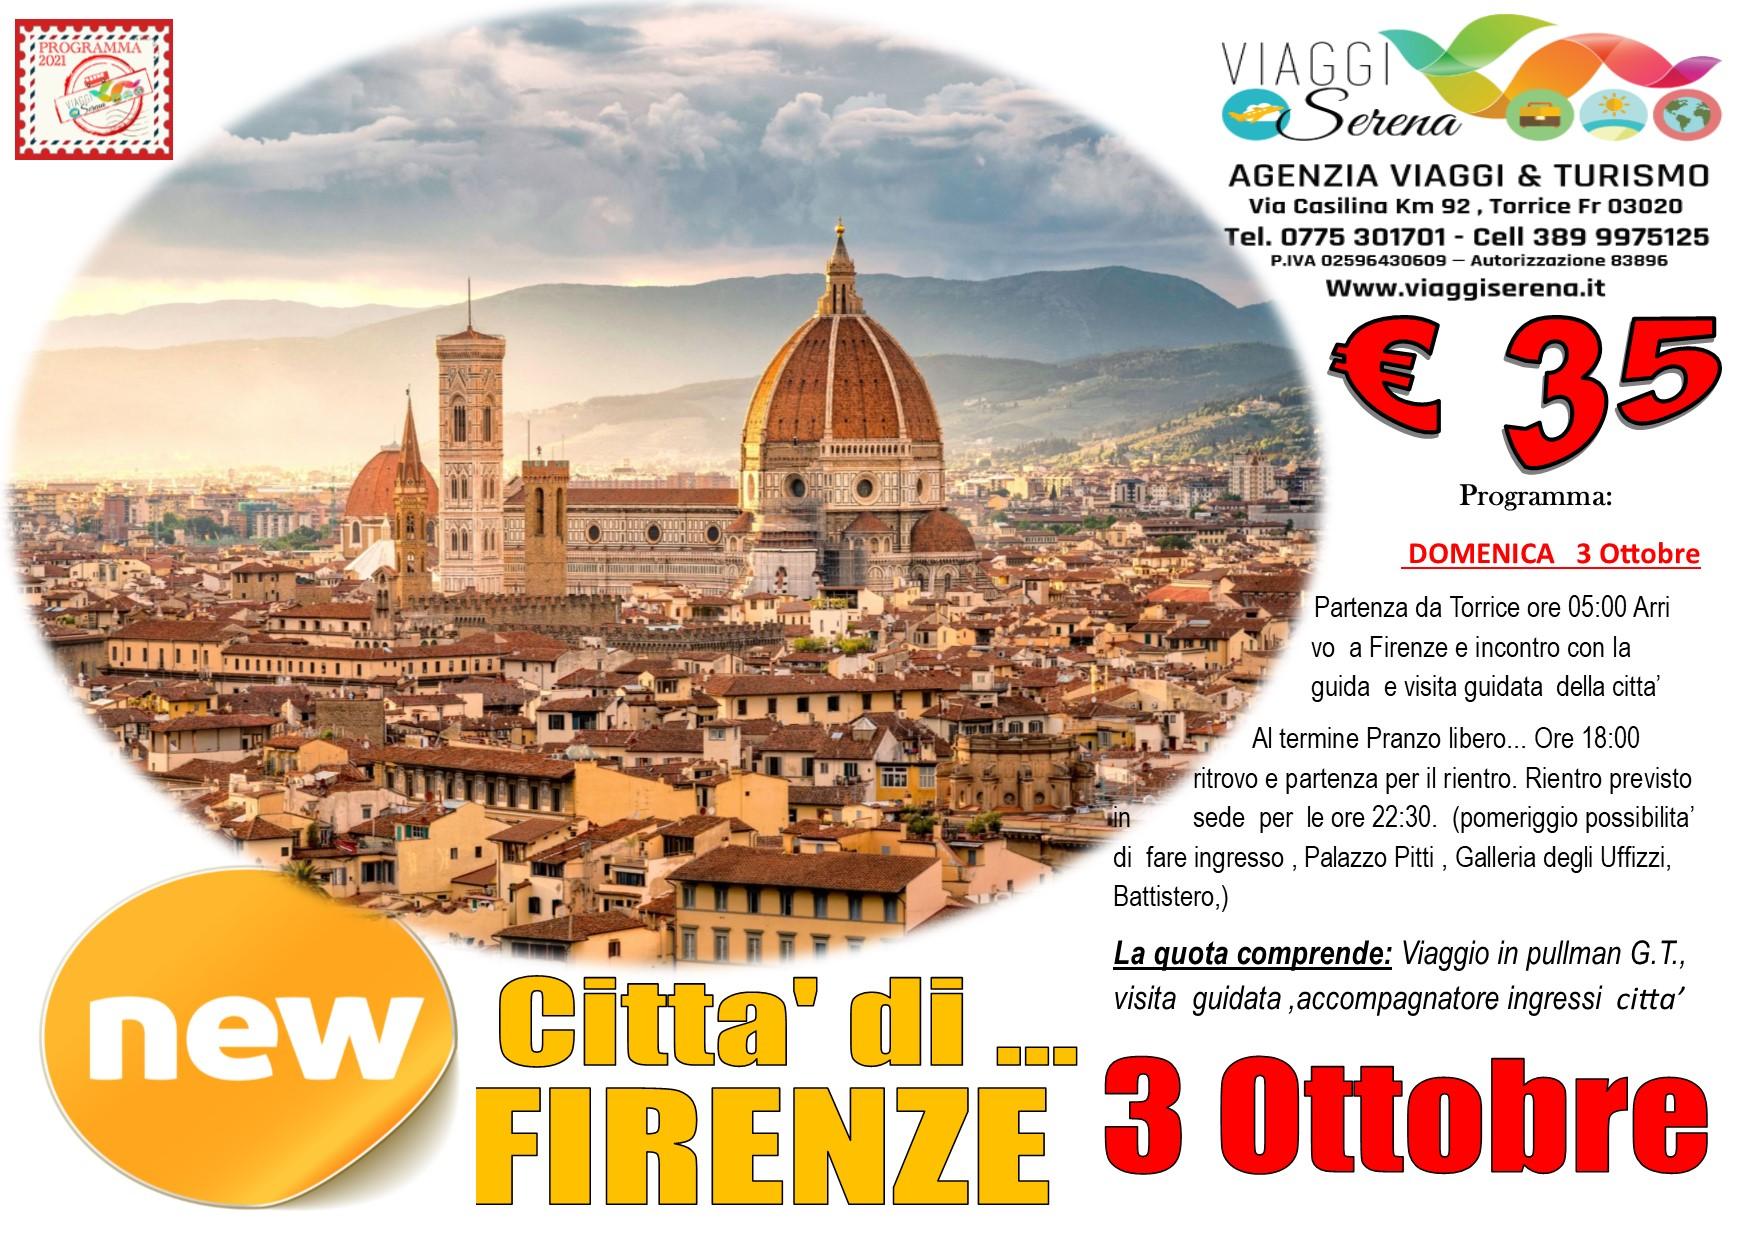 Viaggi di Gruppo: Citta' di FIRENZE 3 Ottobre € 35,00